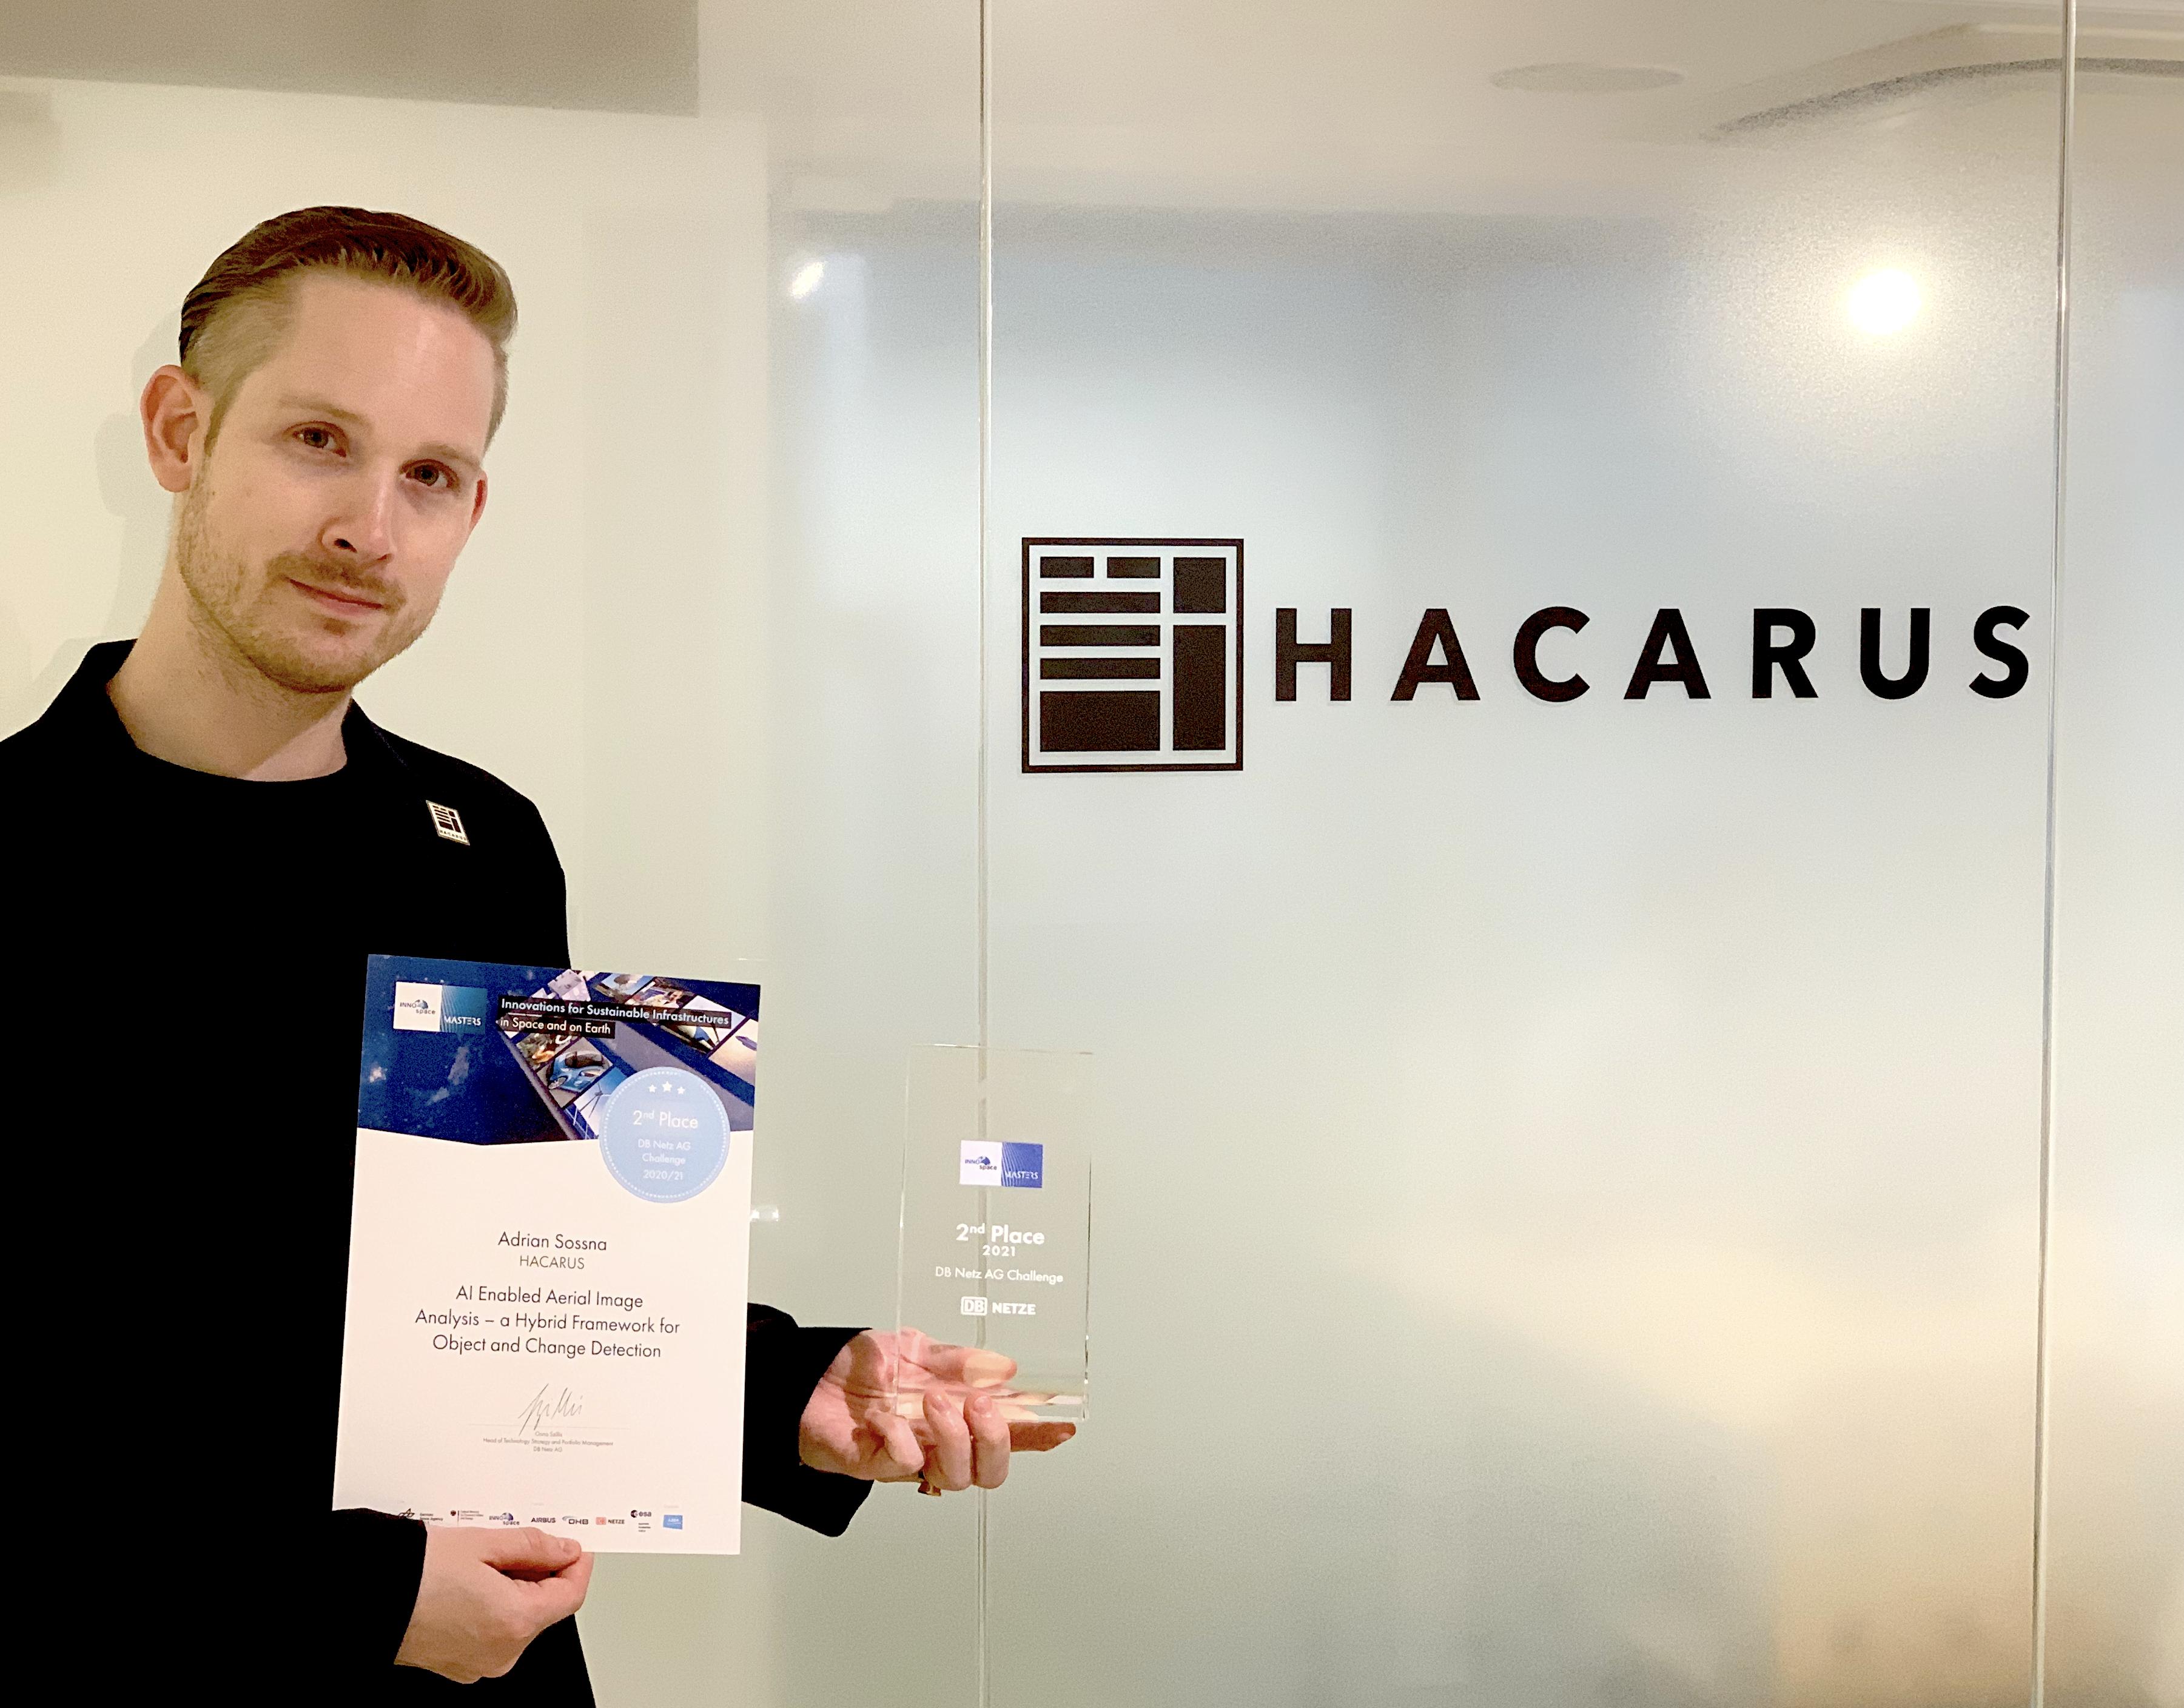 HACARUSの衛星画像分析AIが INNOspace Masters コンテストにて受賞